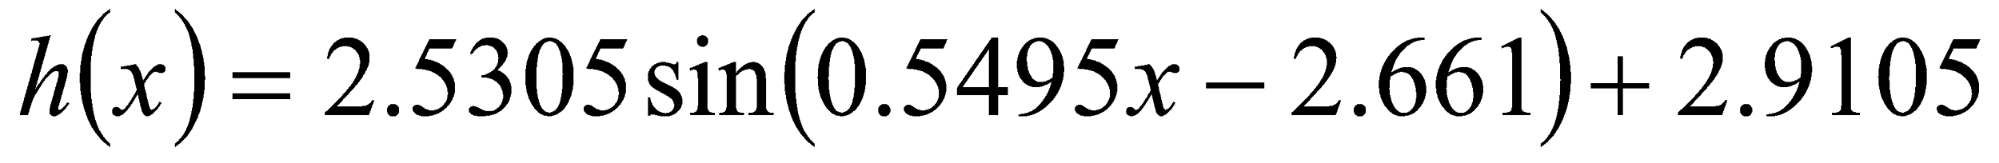 image84.png